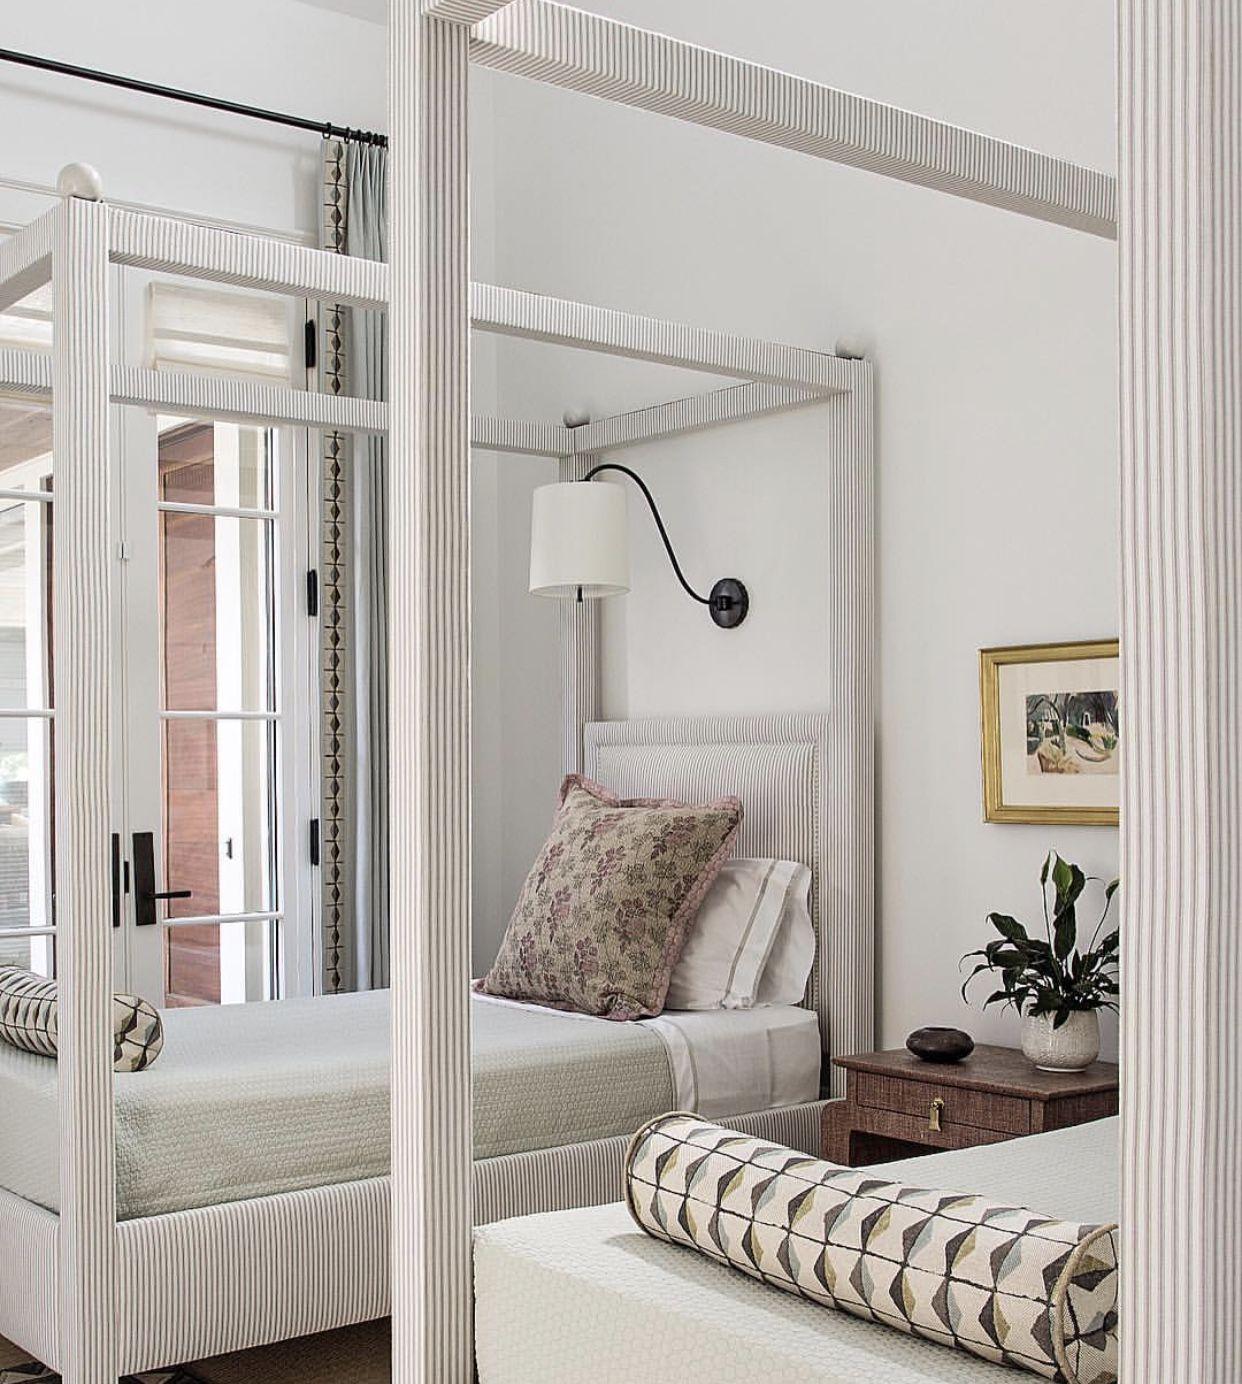 Pin by Erika Howell on Bedrooms Fancy bedroom